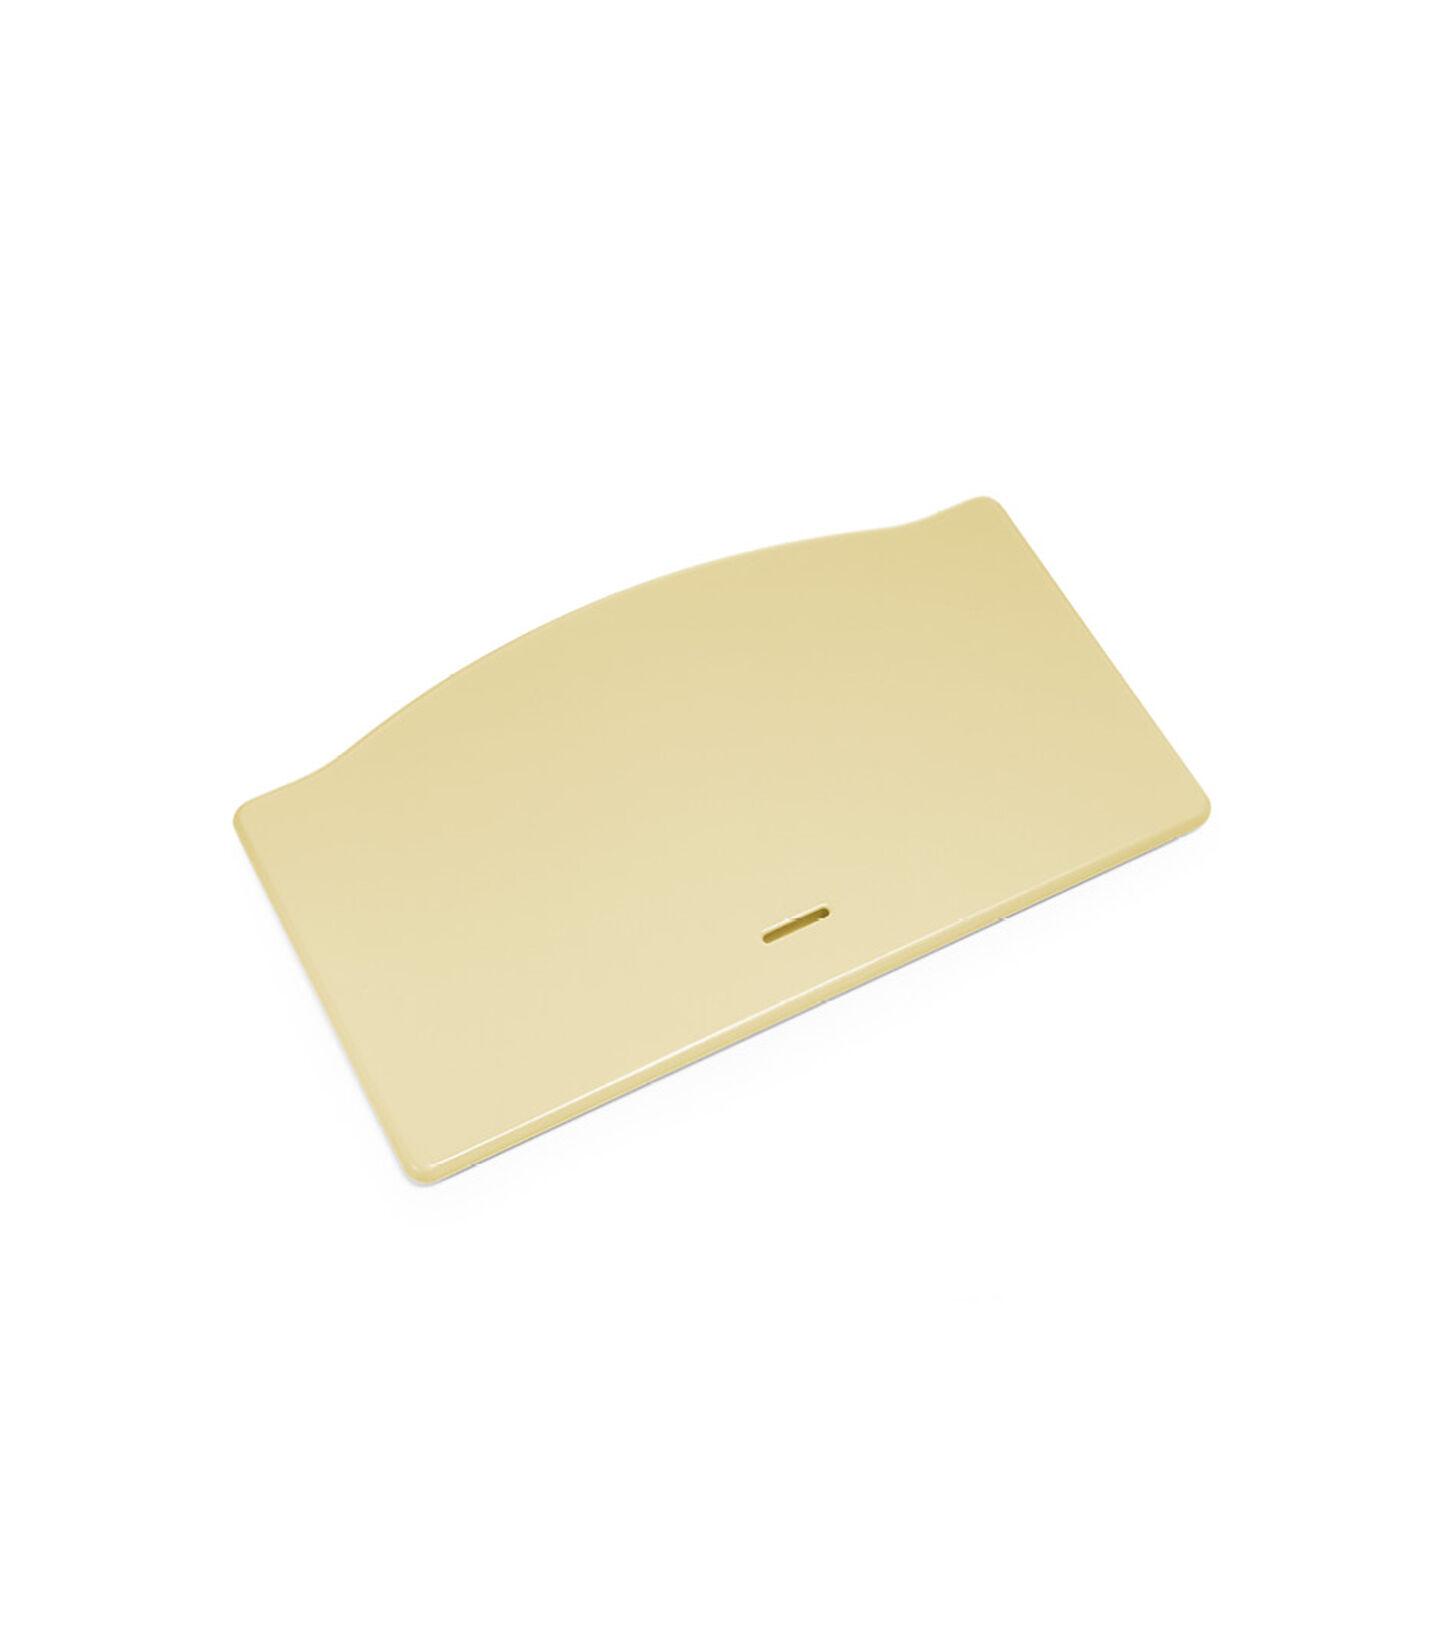 Tripp Trapp® Seatplate Wheat Yellow, Wheat Yellow, mainview